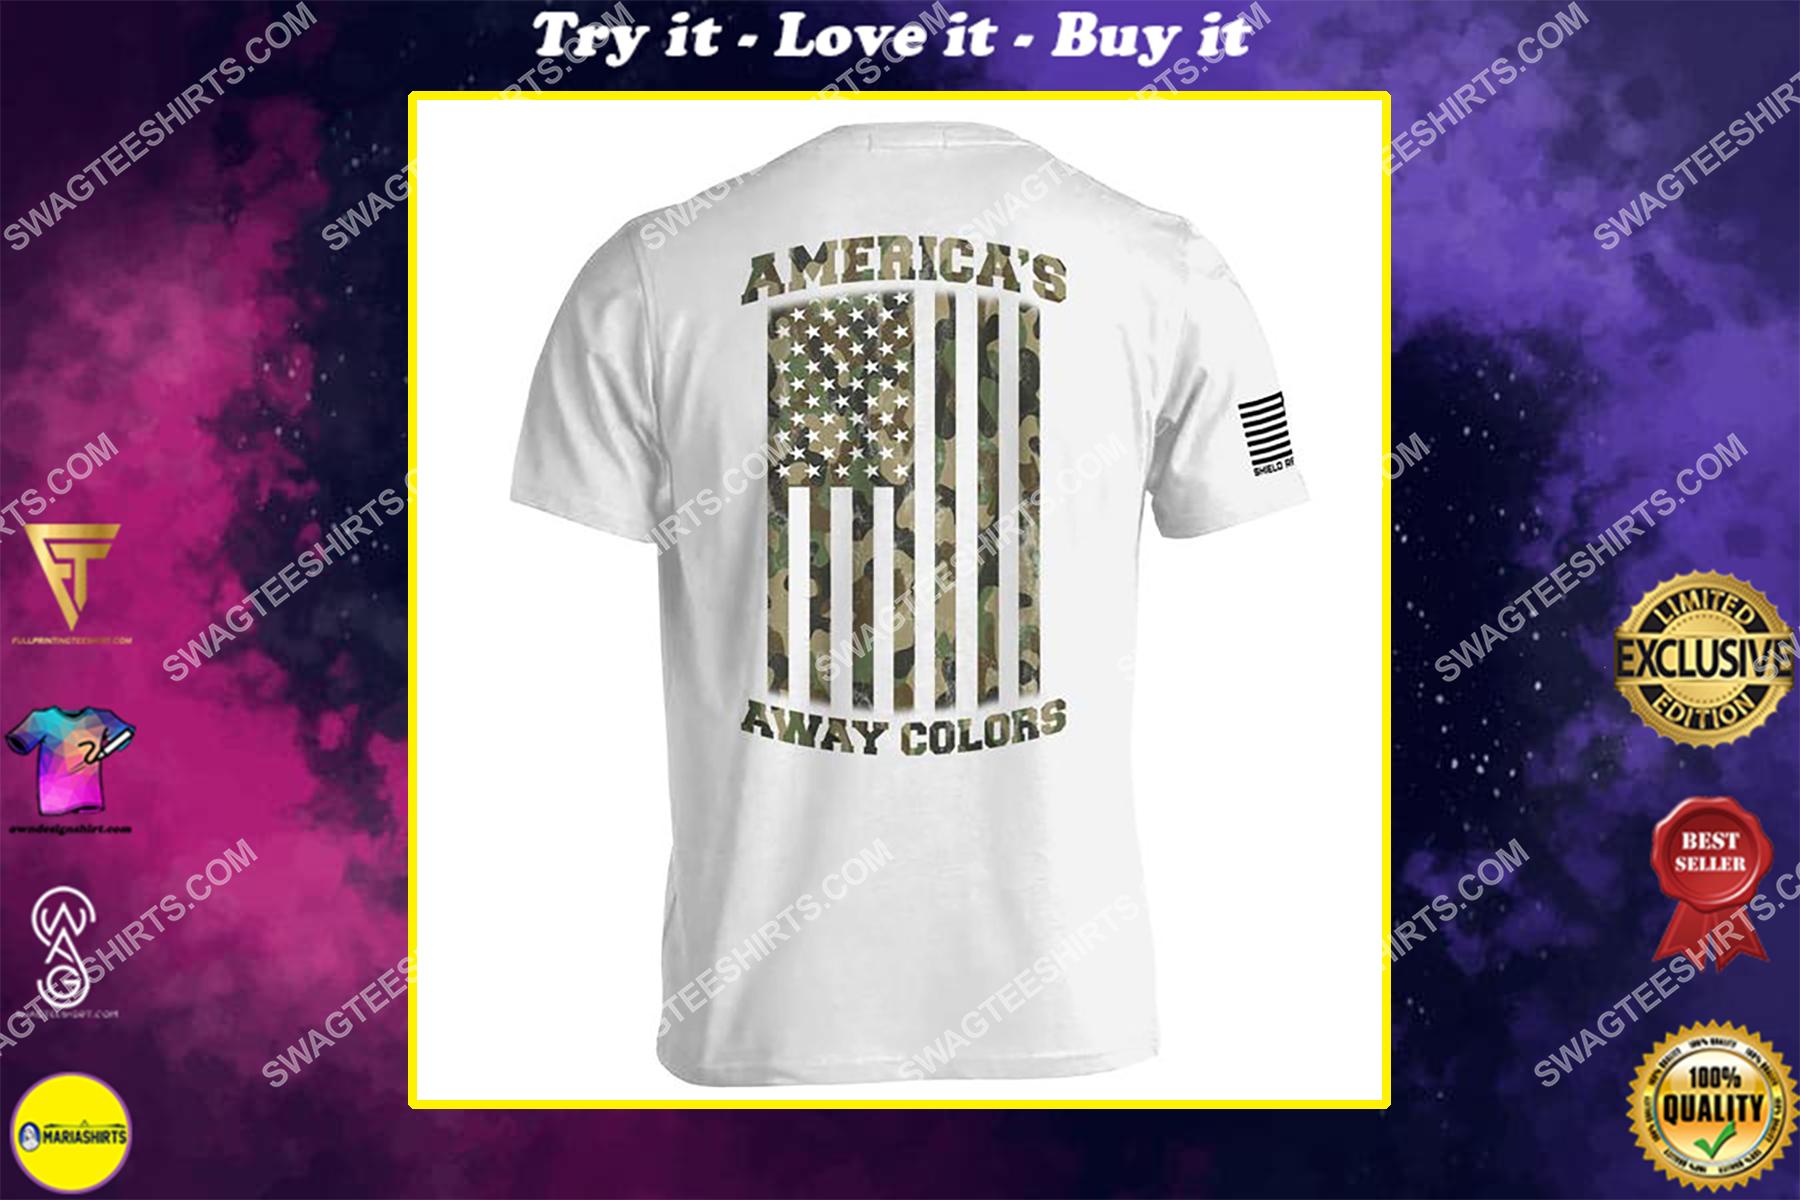 american flag camo americas away colors political shirt